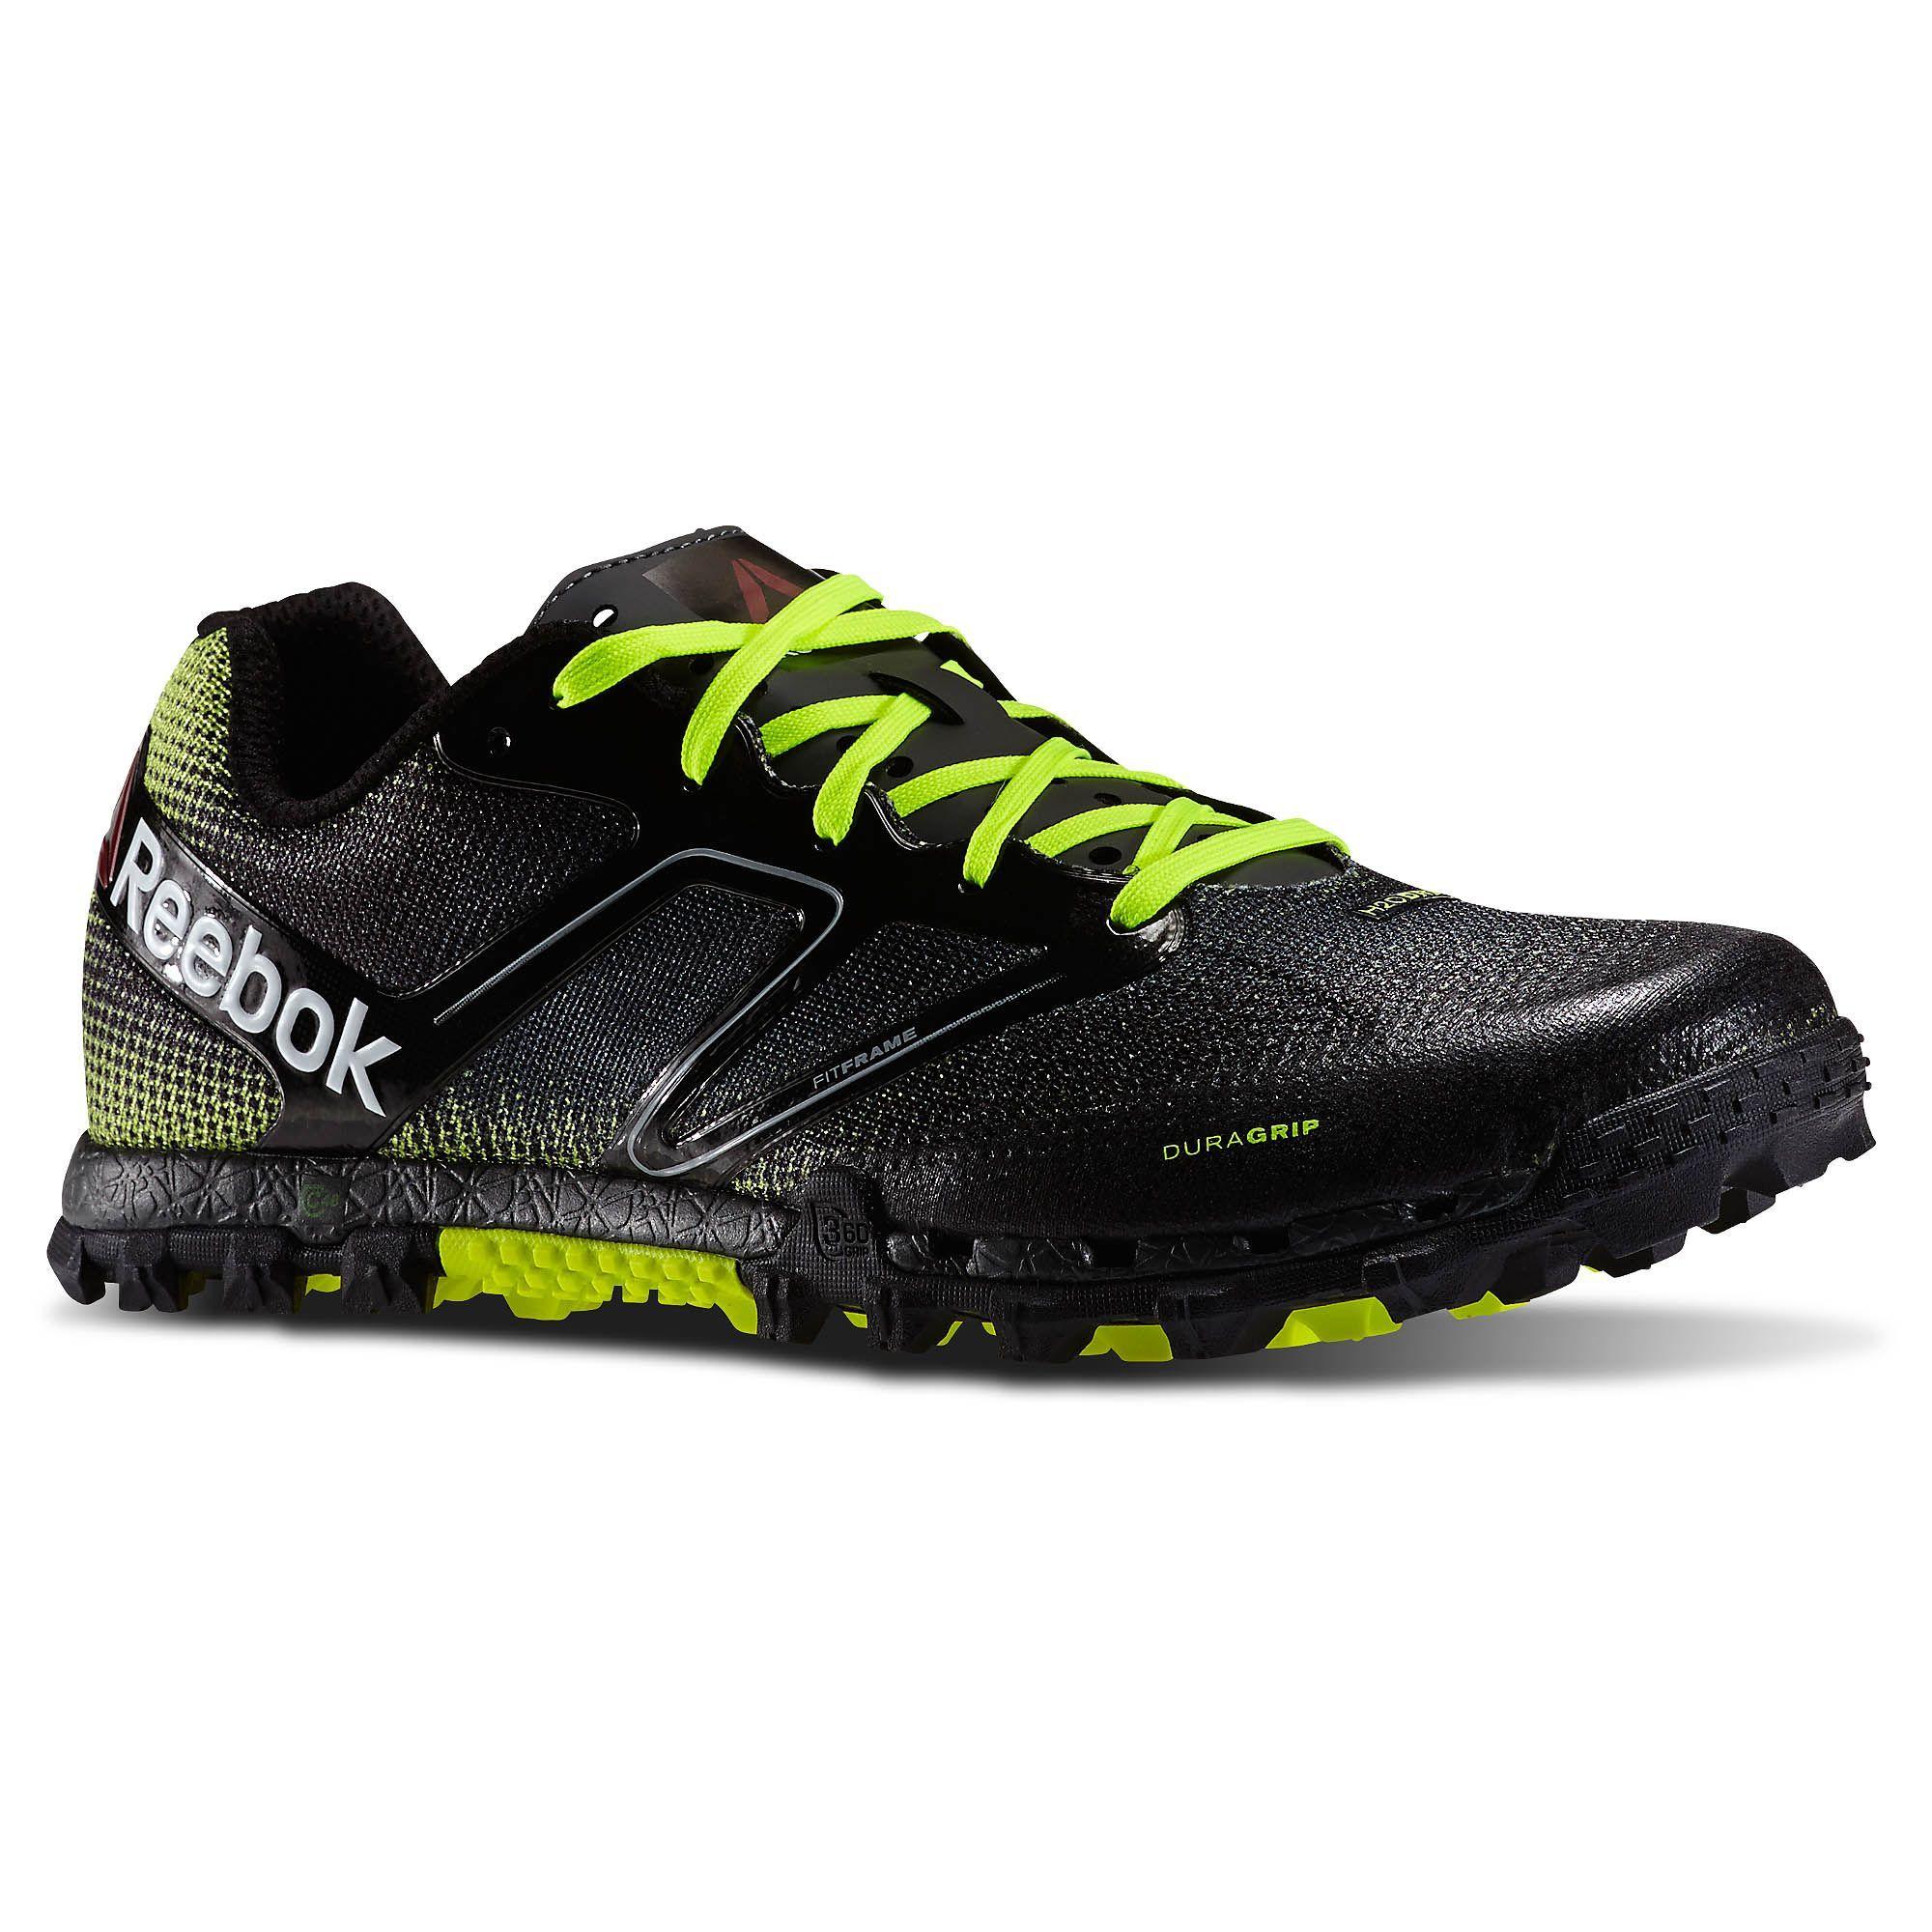 chaussure reebok spartan race reebok race spartan spartan reebok chaussure chaussure iukZPX